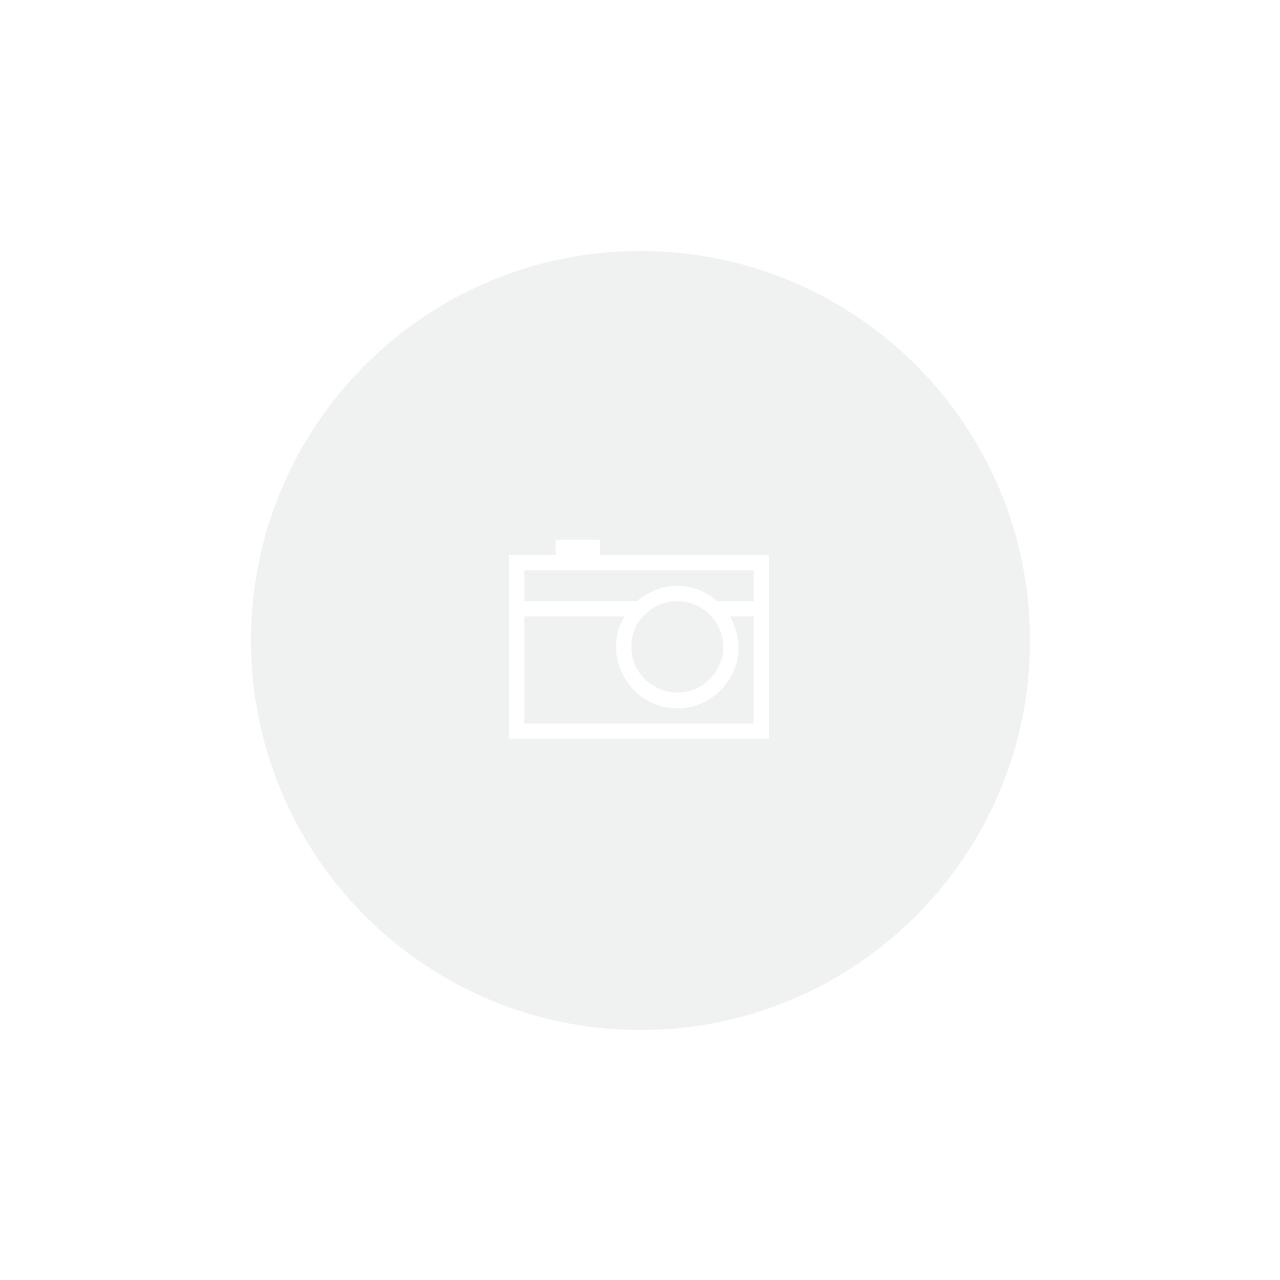 Máquina de Tosa Profissonal Oster A6 SLIM 3 Velocidades - Bivolt